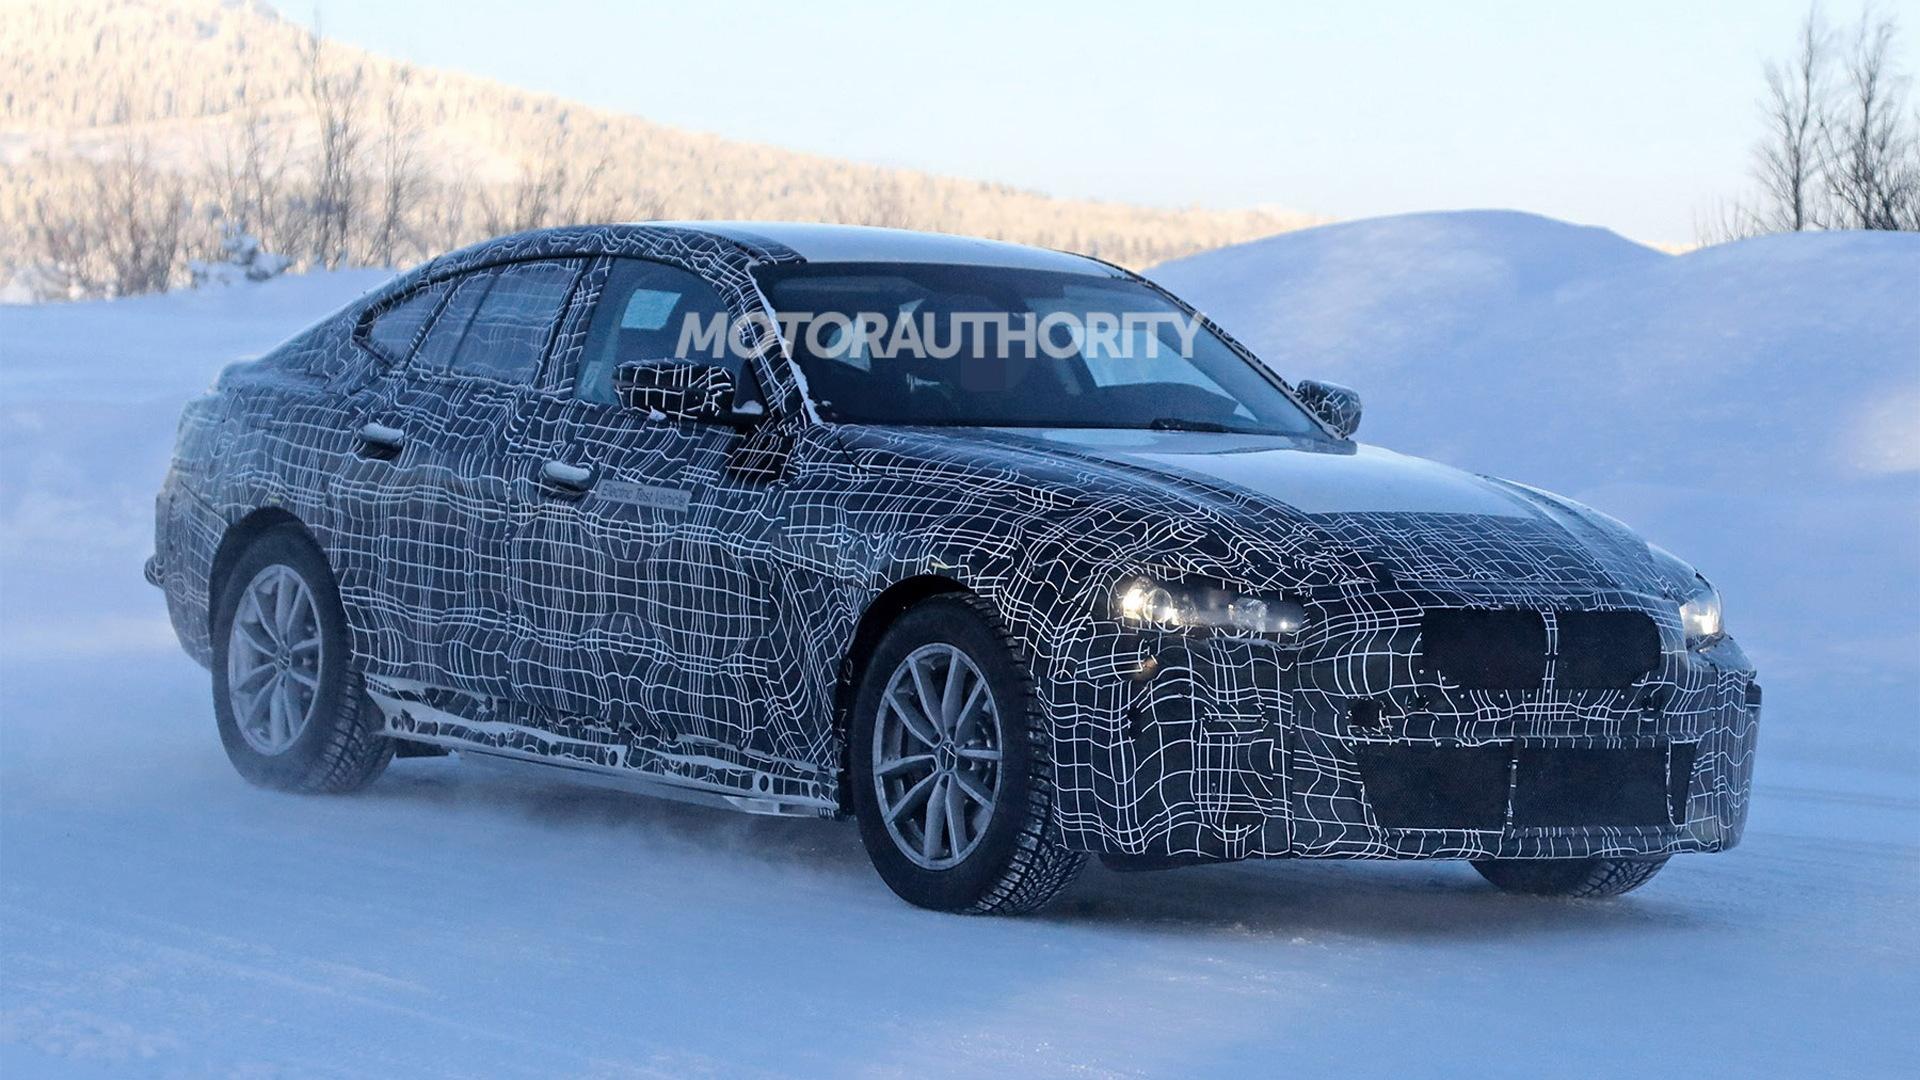 2022 BMW i4 spy shots - Image via S. Baldauf/SB-Medien